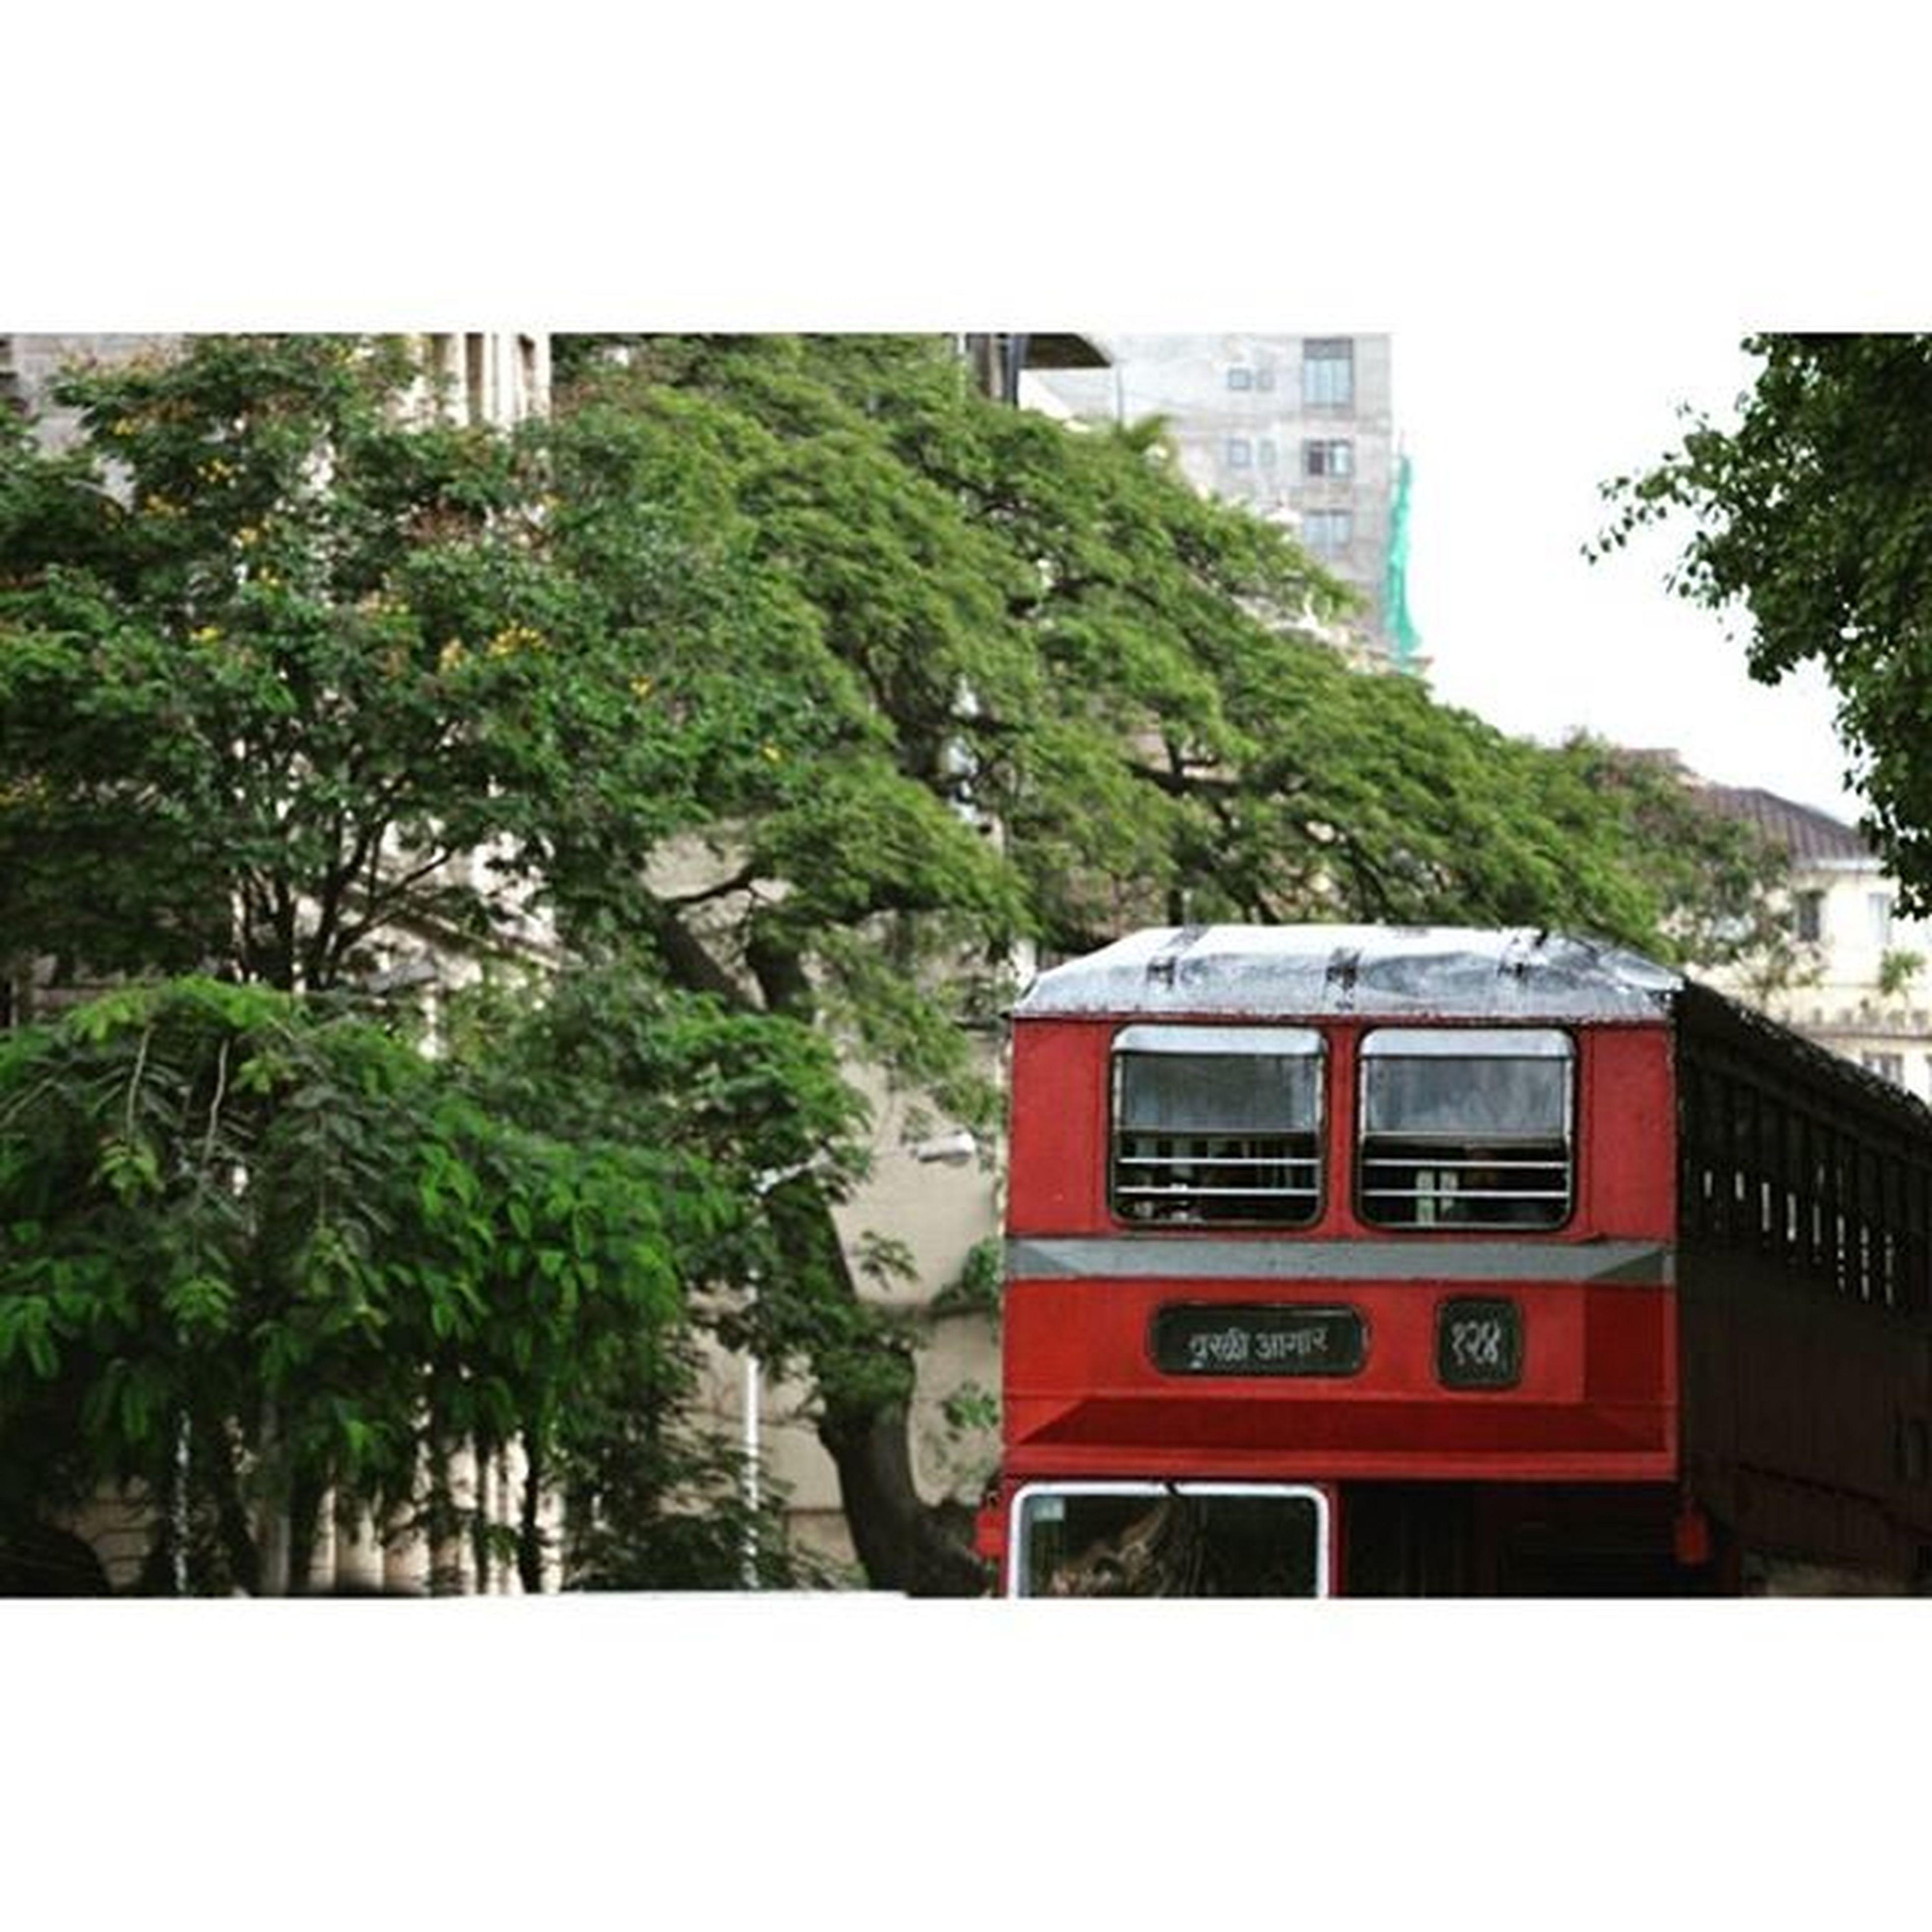 The Streets of Mumbai Vscocam VSCO Vscomumbai Vscogood Travel Igersoftheday Ig_captures Streetphotography MumbaiDiaries Street Doubledeckar Travelgrams Photodaily Instagood Instadaily Picoftheday Capture Moment Minimil